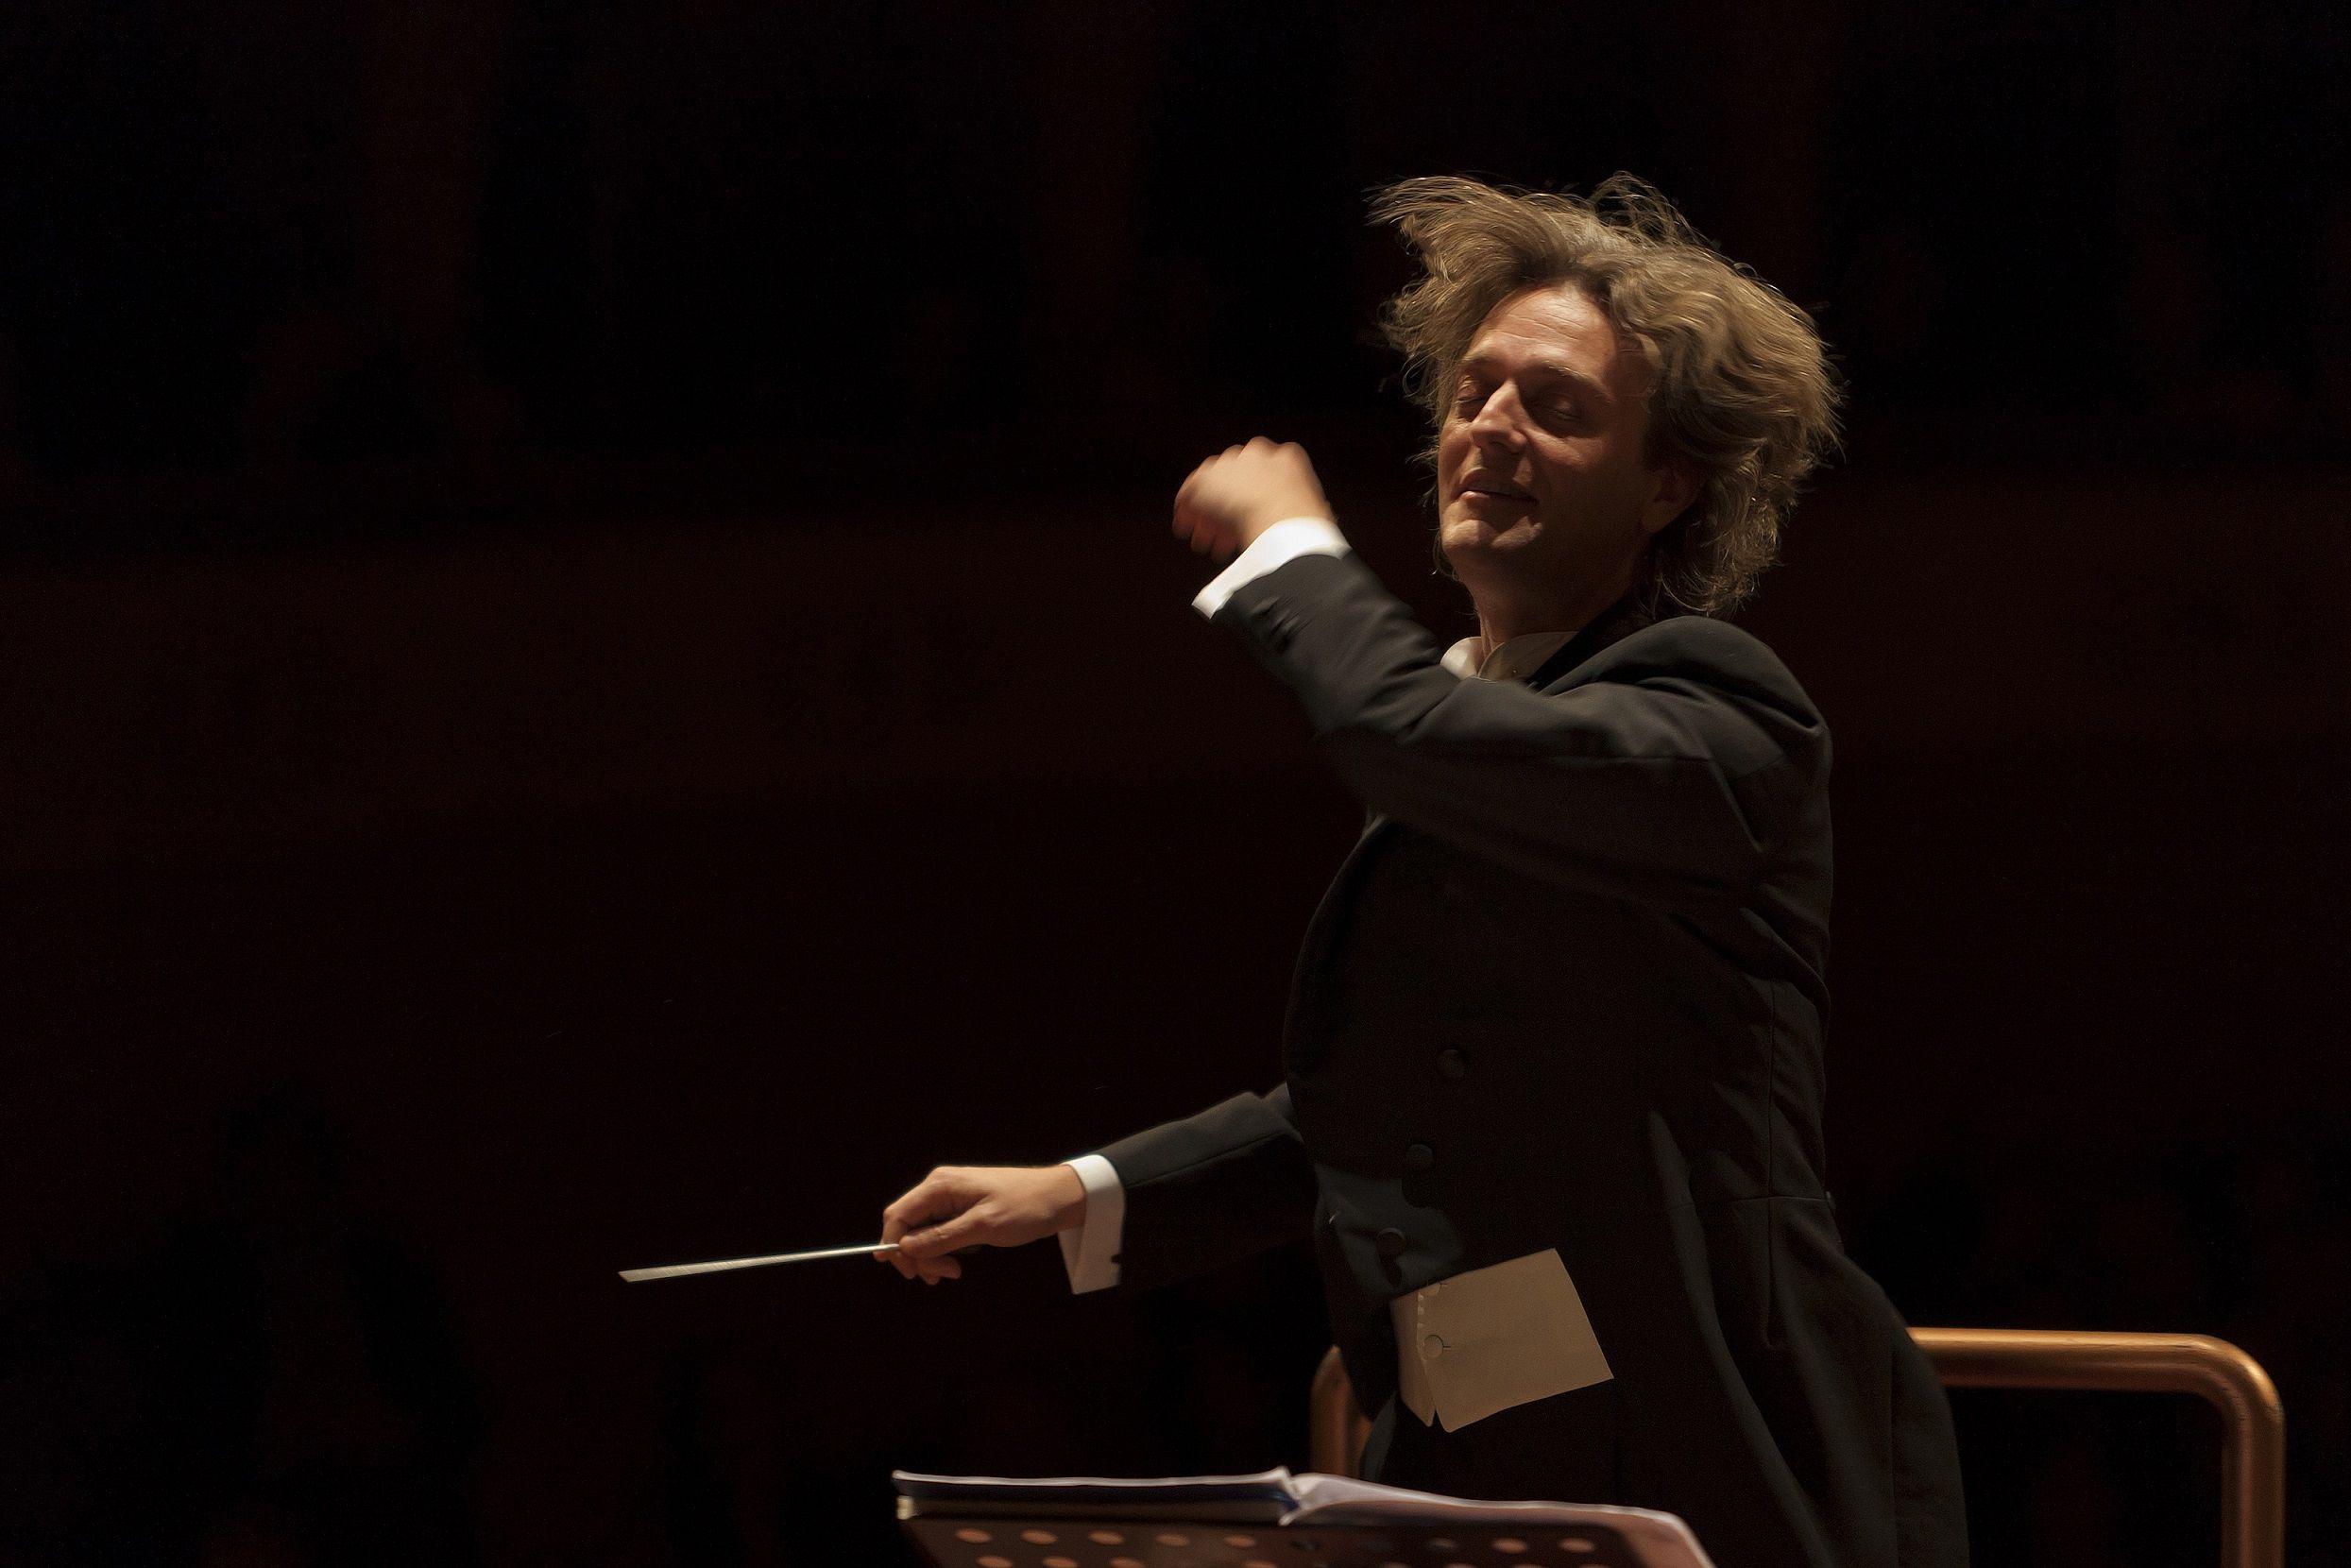 daniele giorgi stagione sinfonica